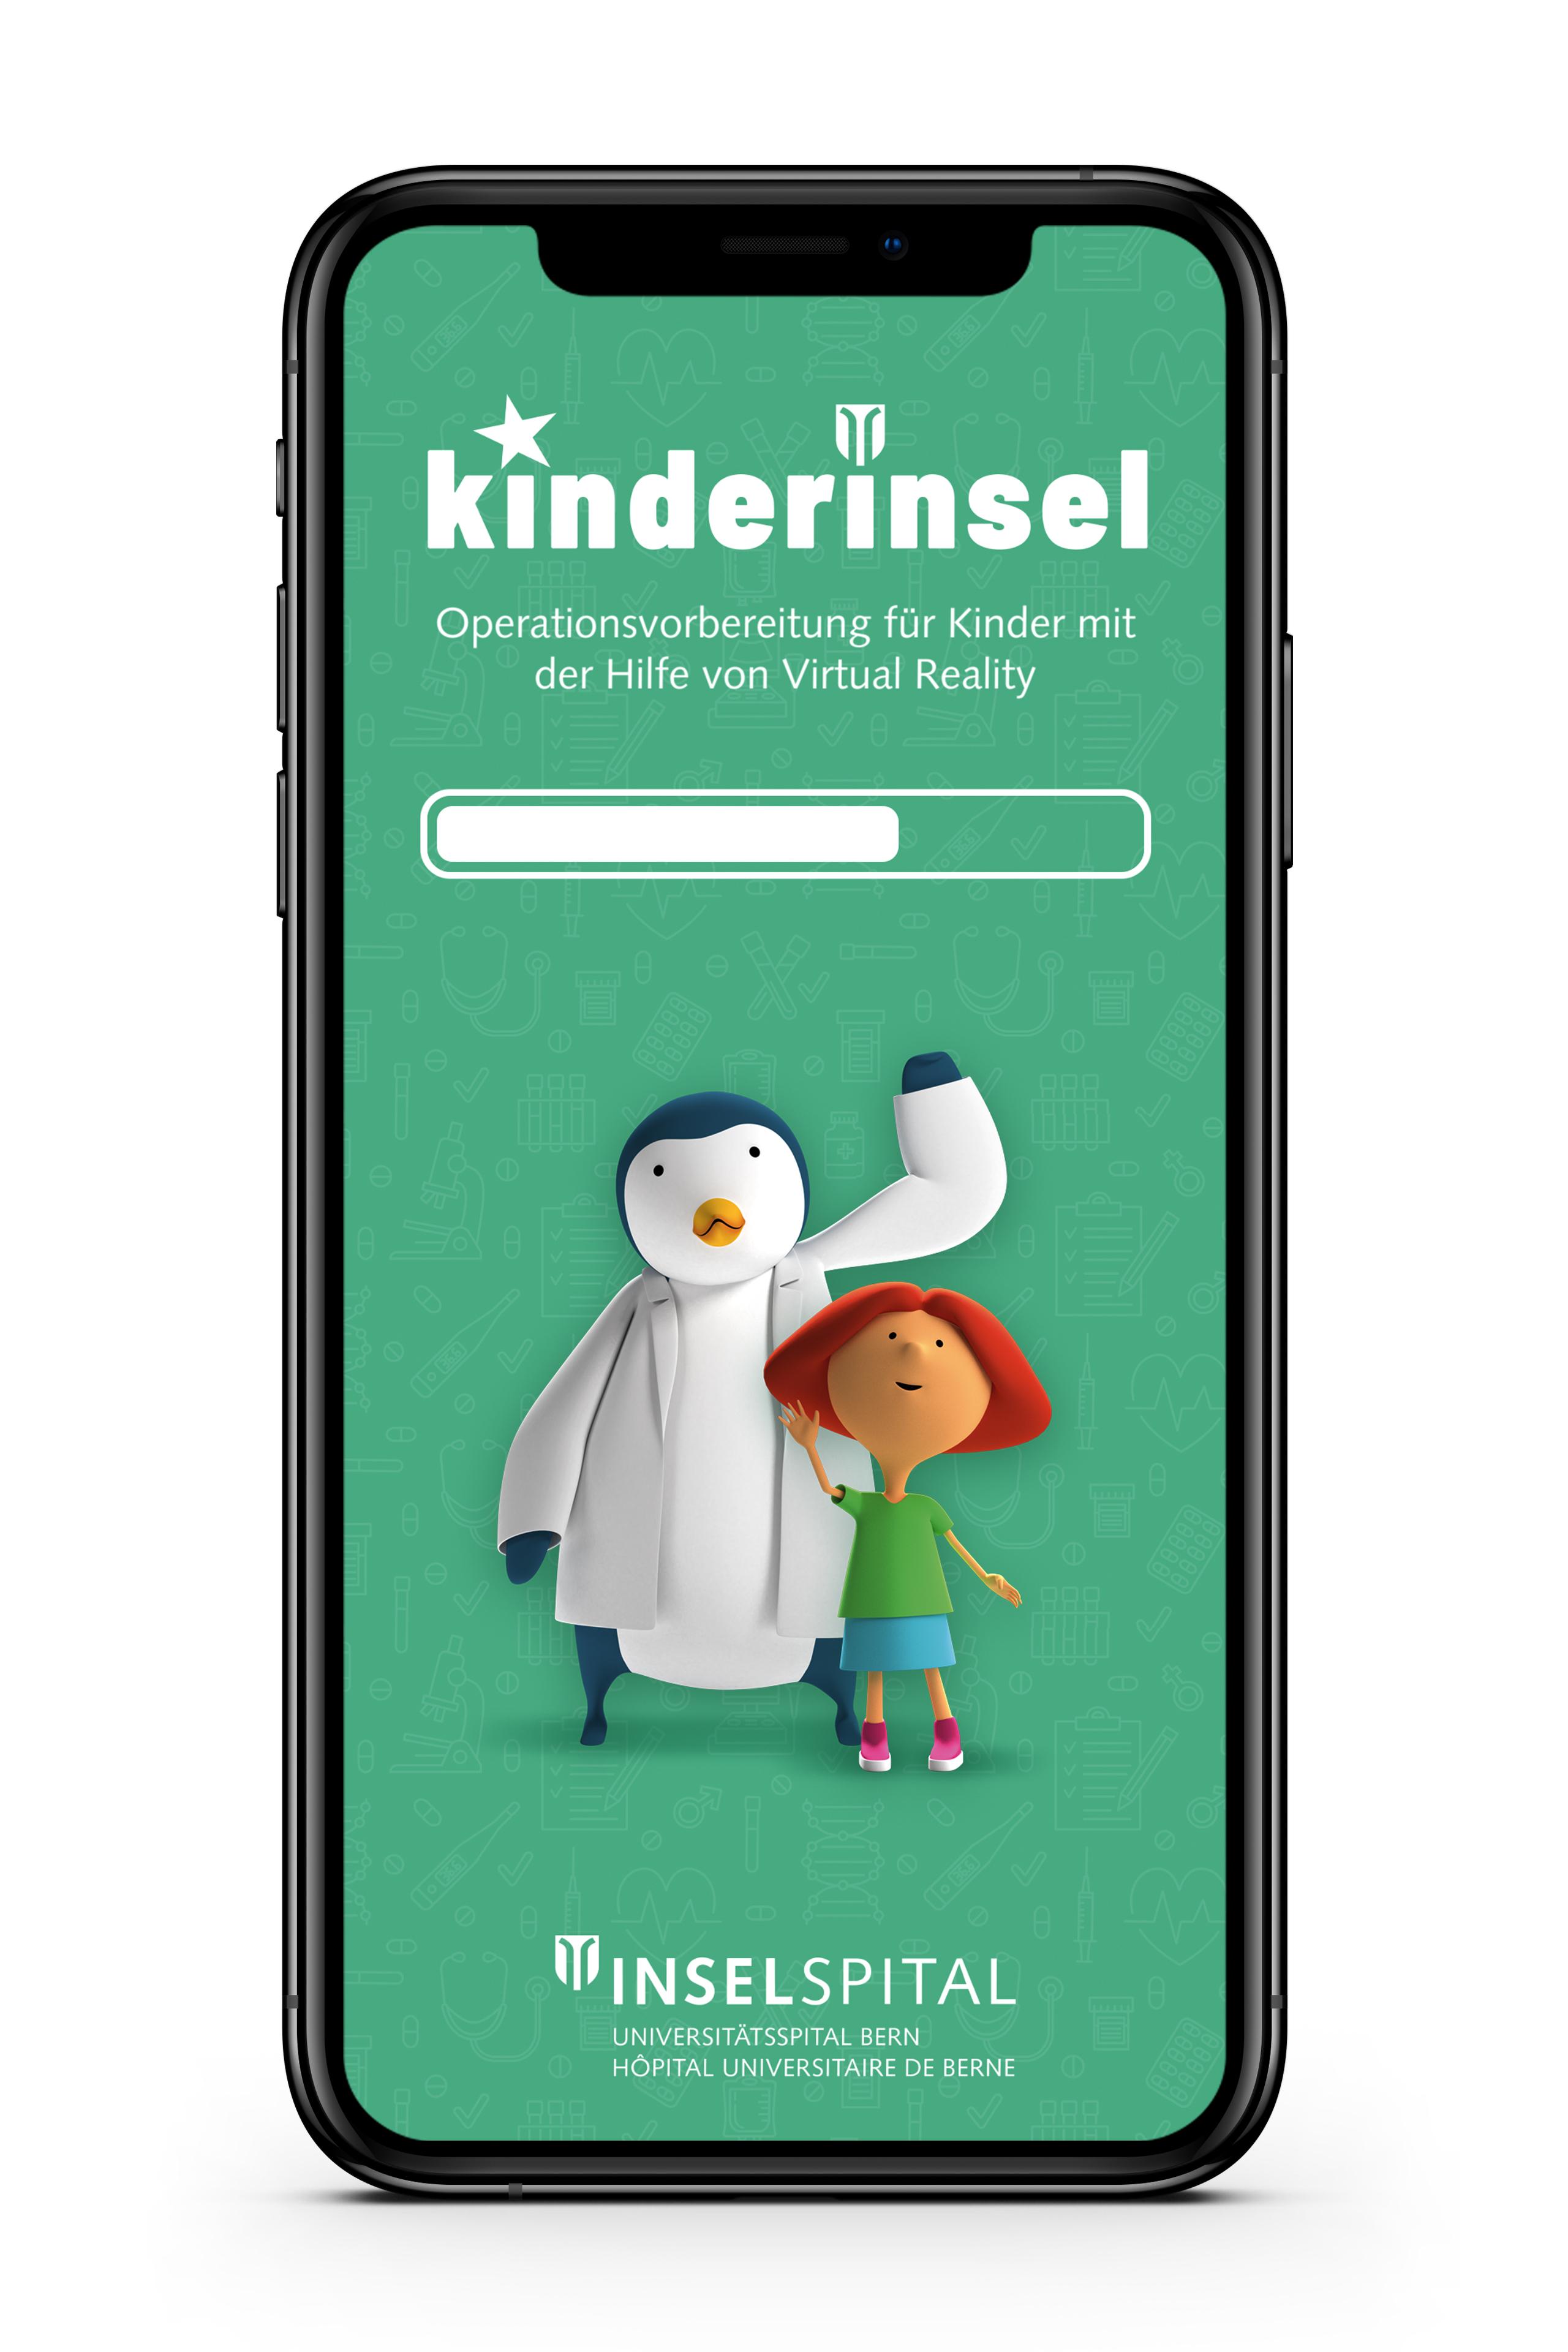 kinderinsel_07